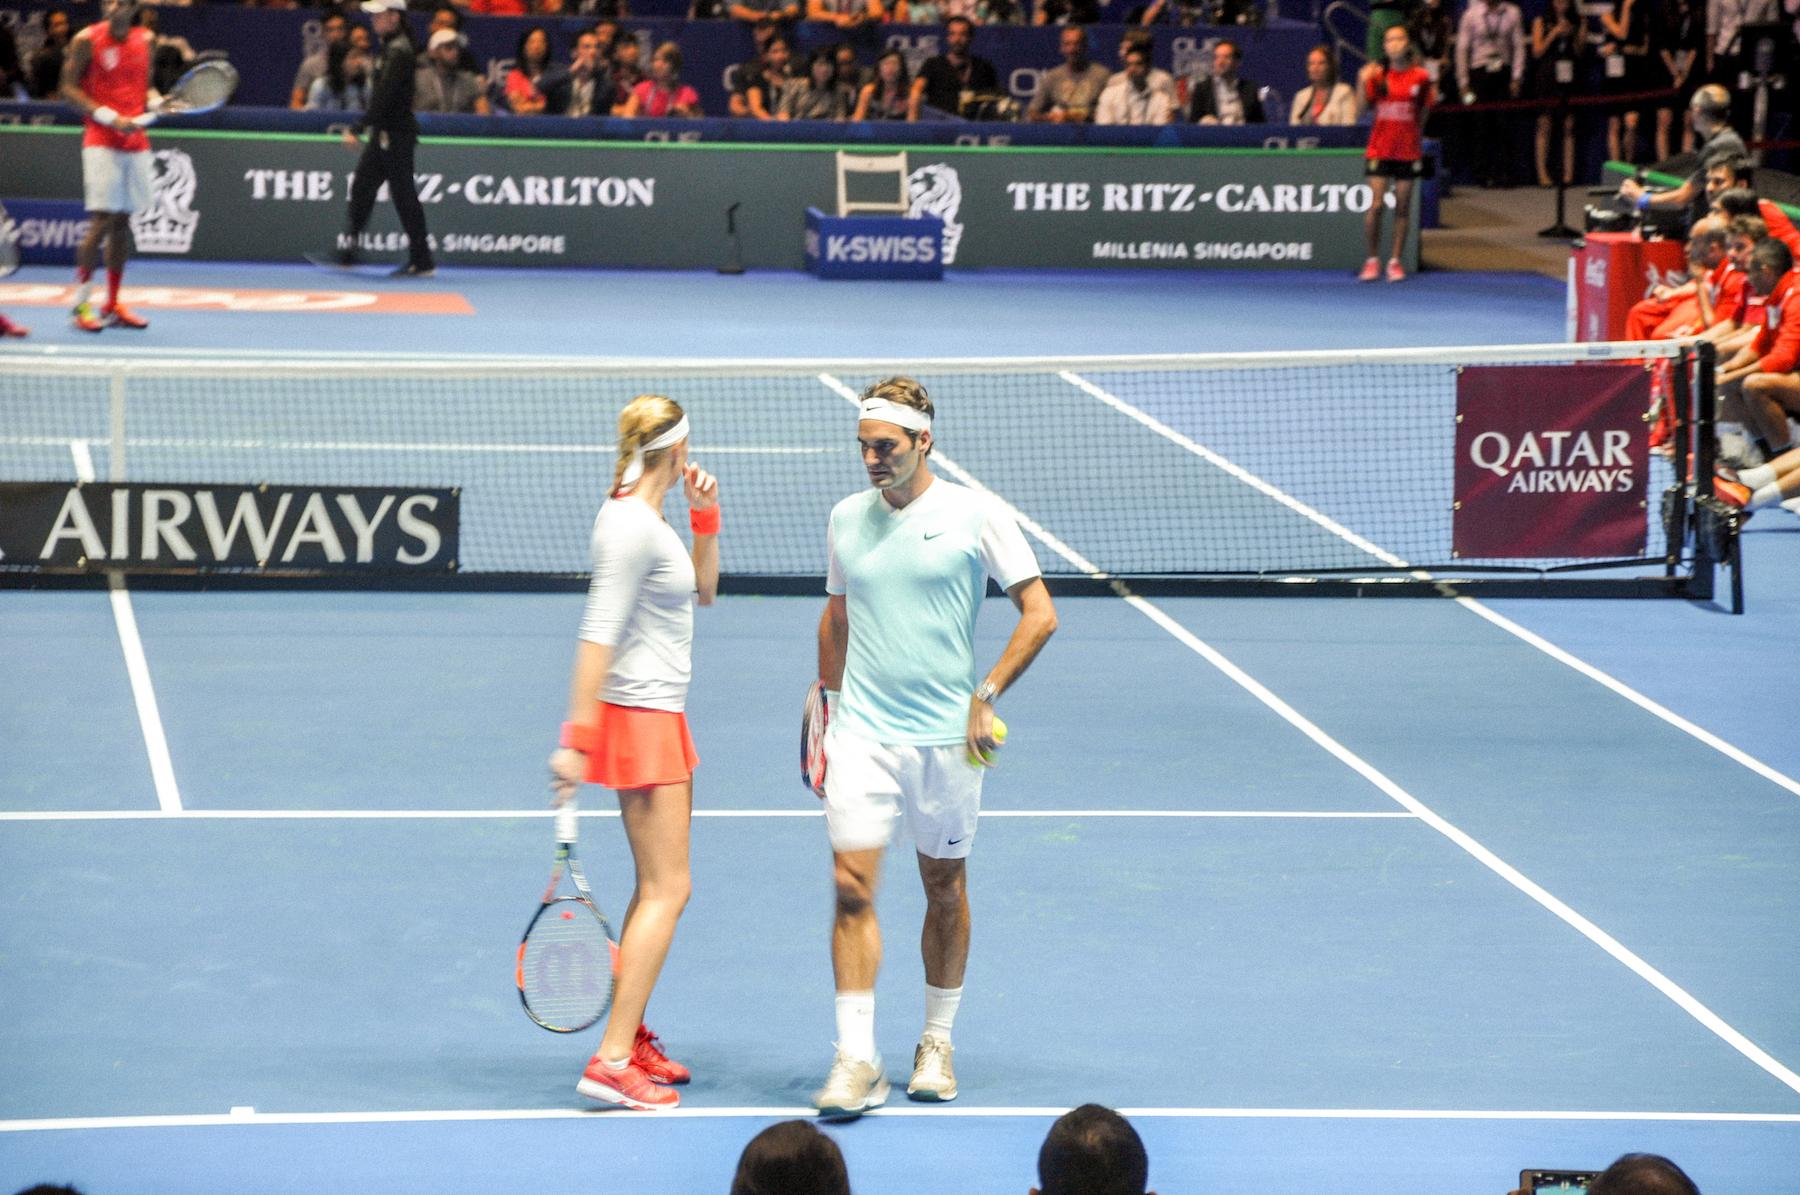 Mixed doubles match between Federer/Mladenovic and Brown/Pliskova